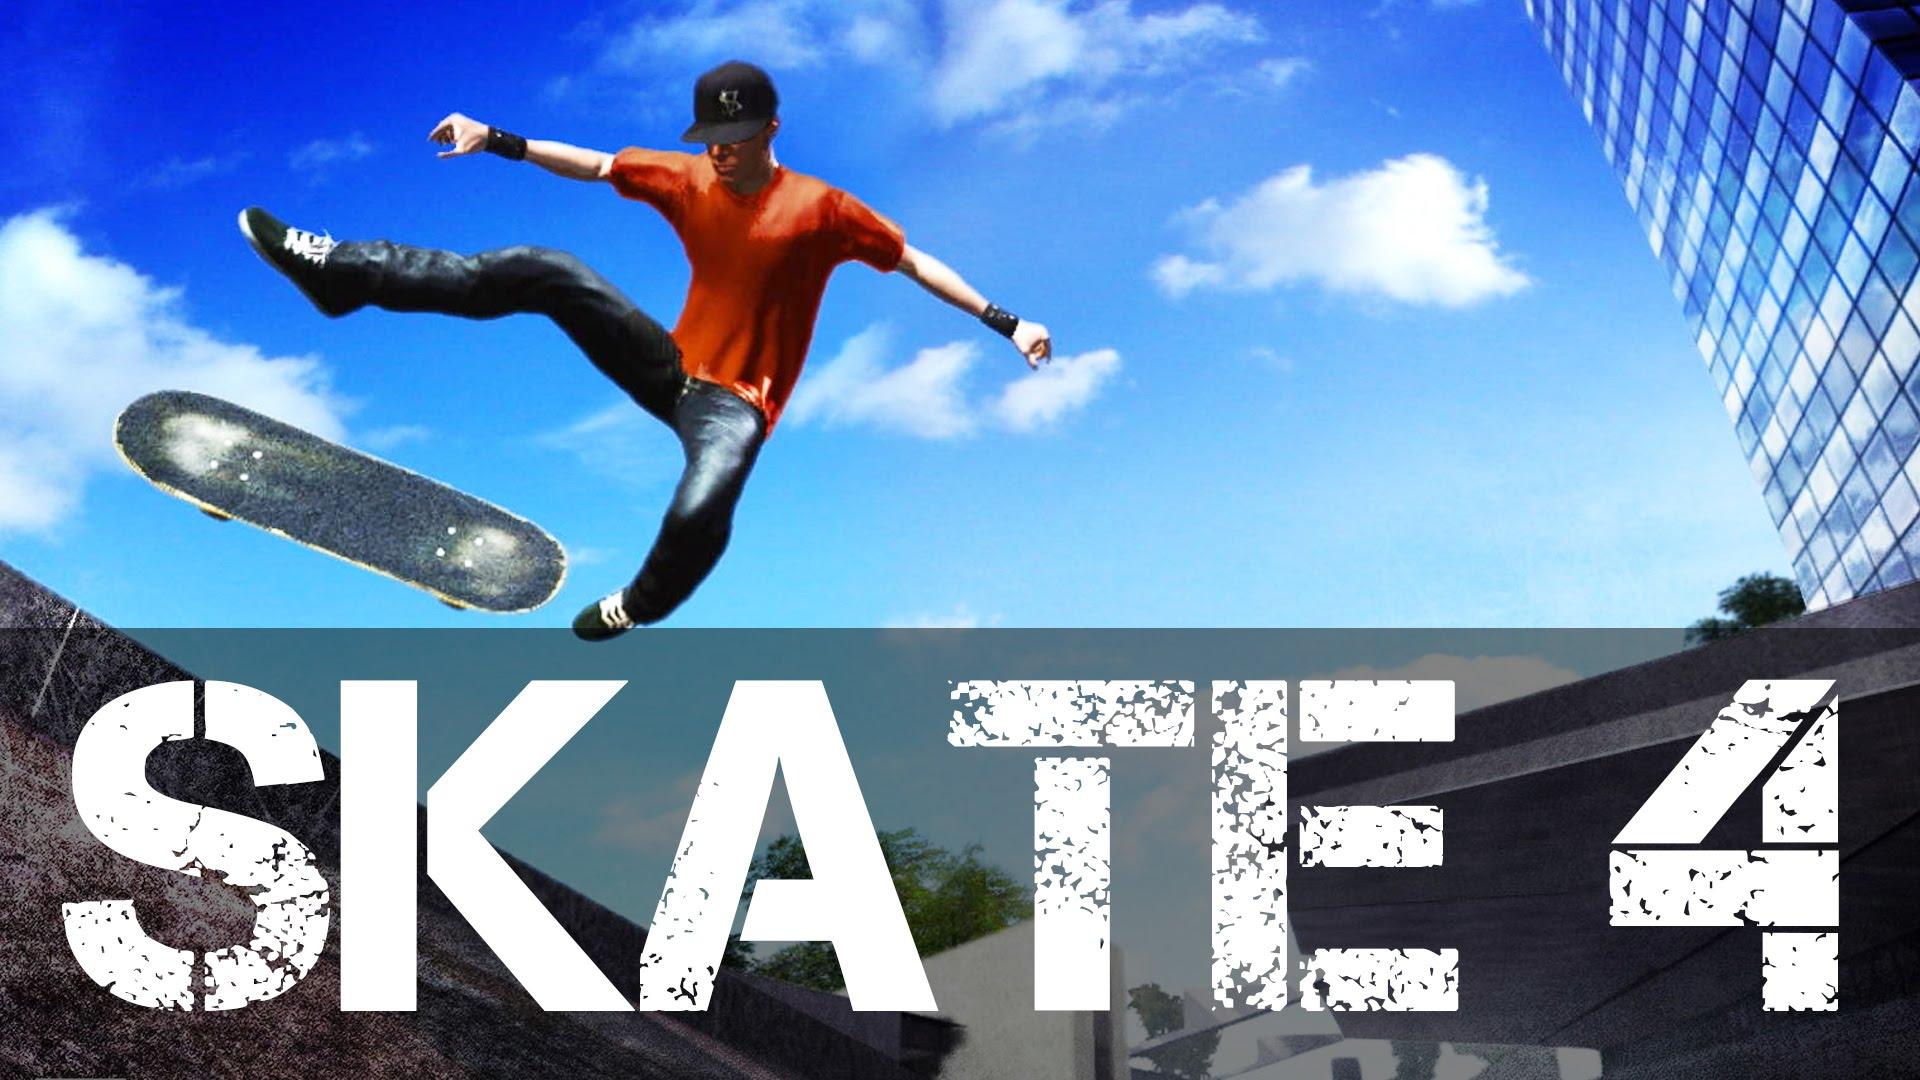 Skate 4 banner library download Confirmed: Skate 4 is not happening banner library download